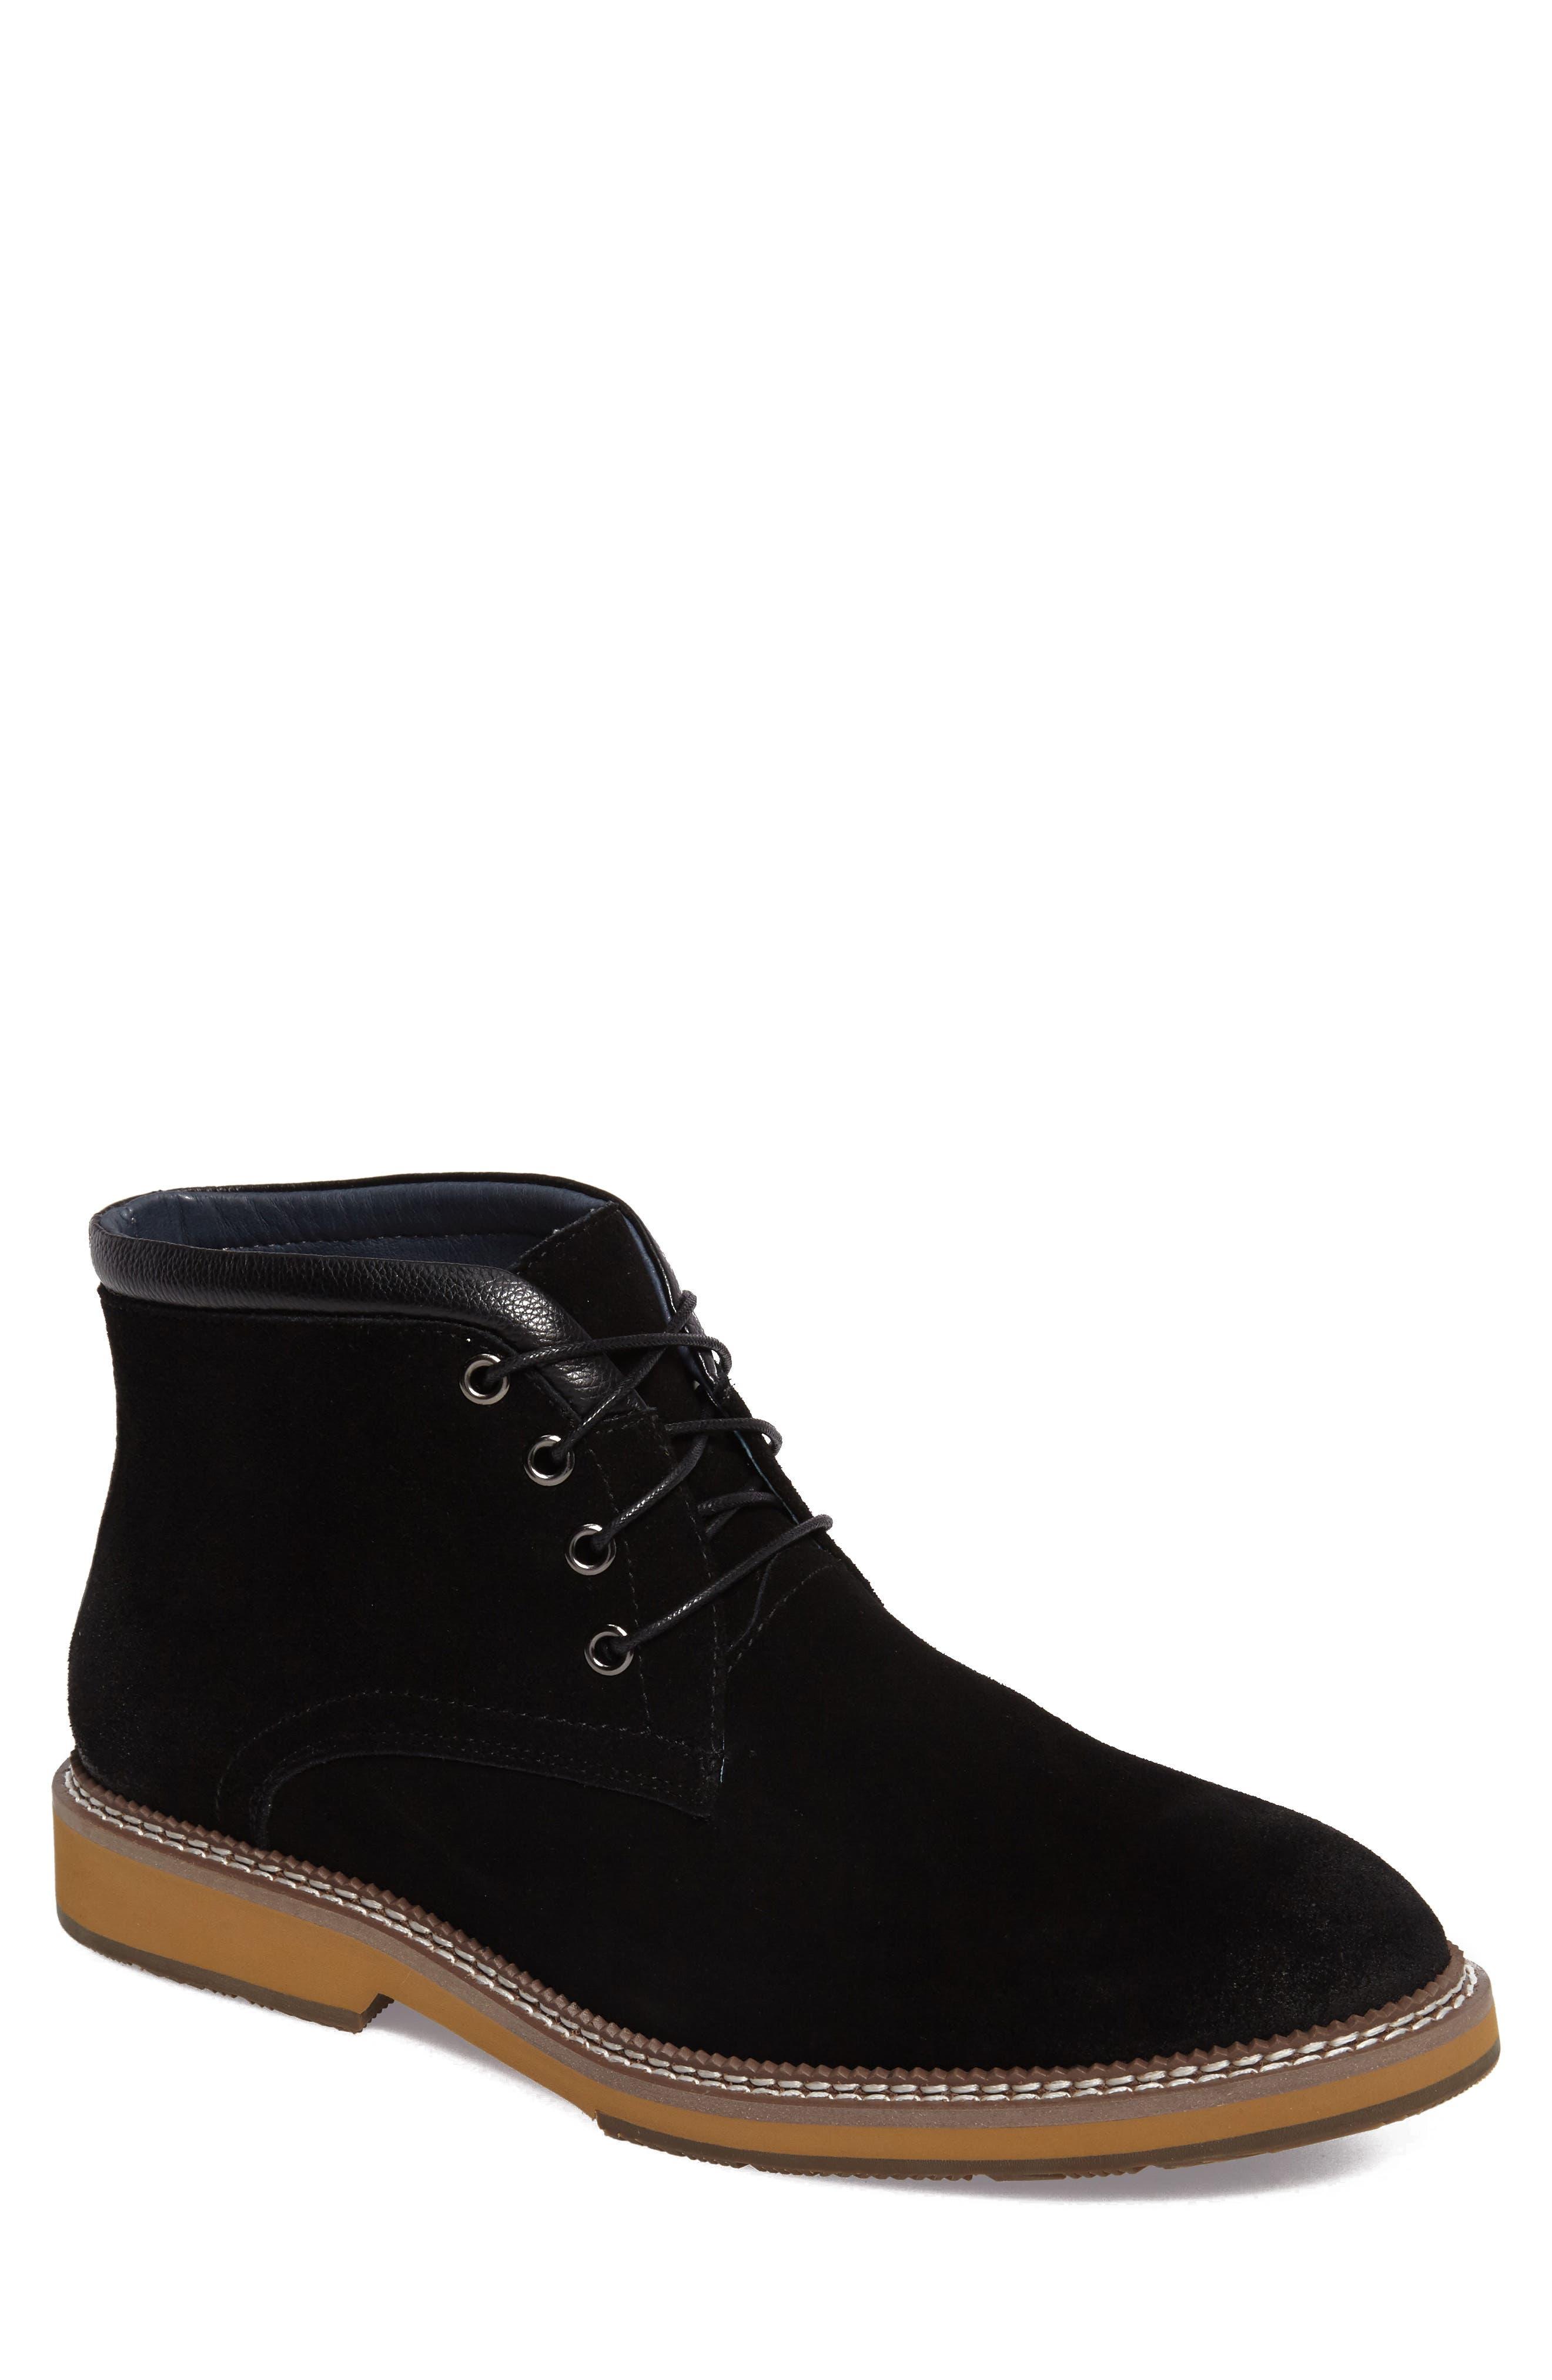 Lazo Chukka Boot,                         Main,                         color, Black Leather